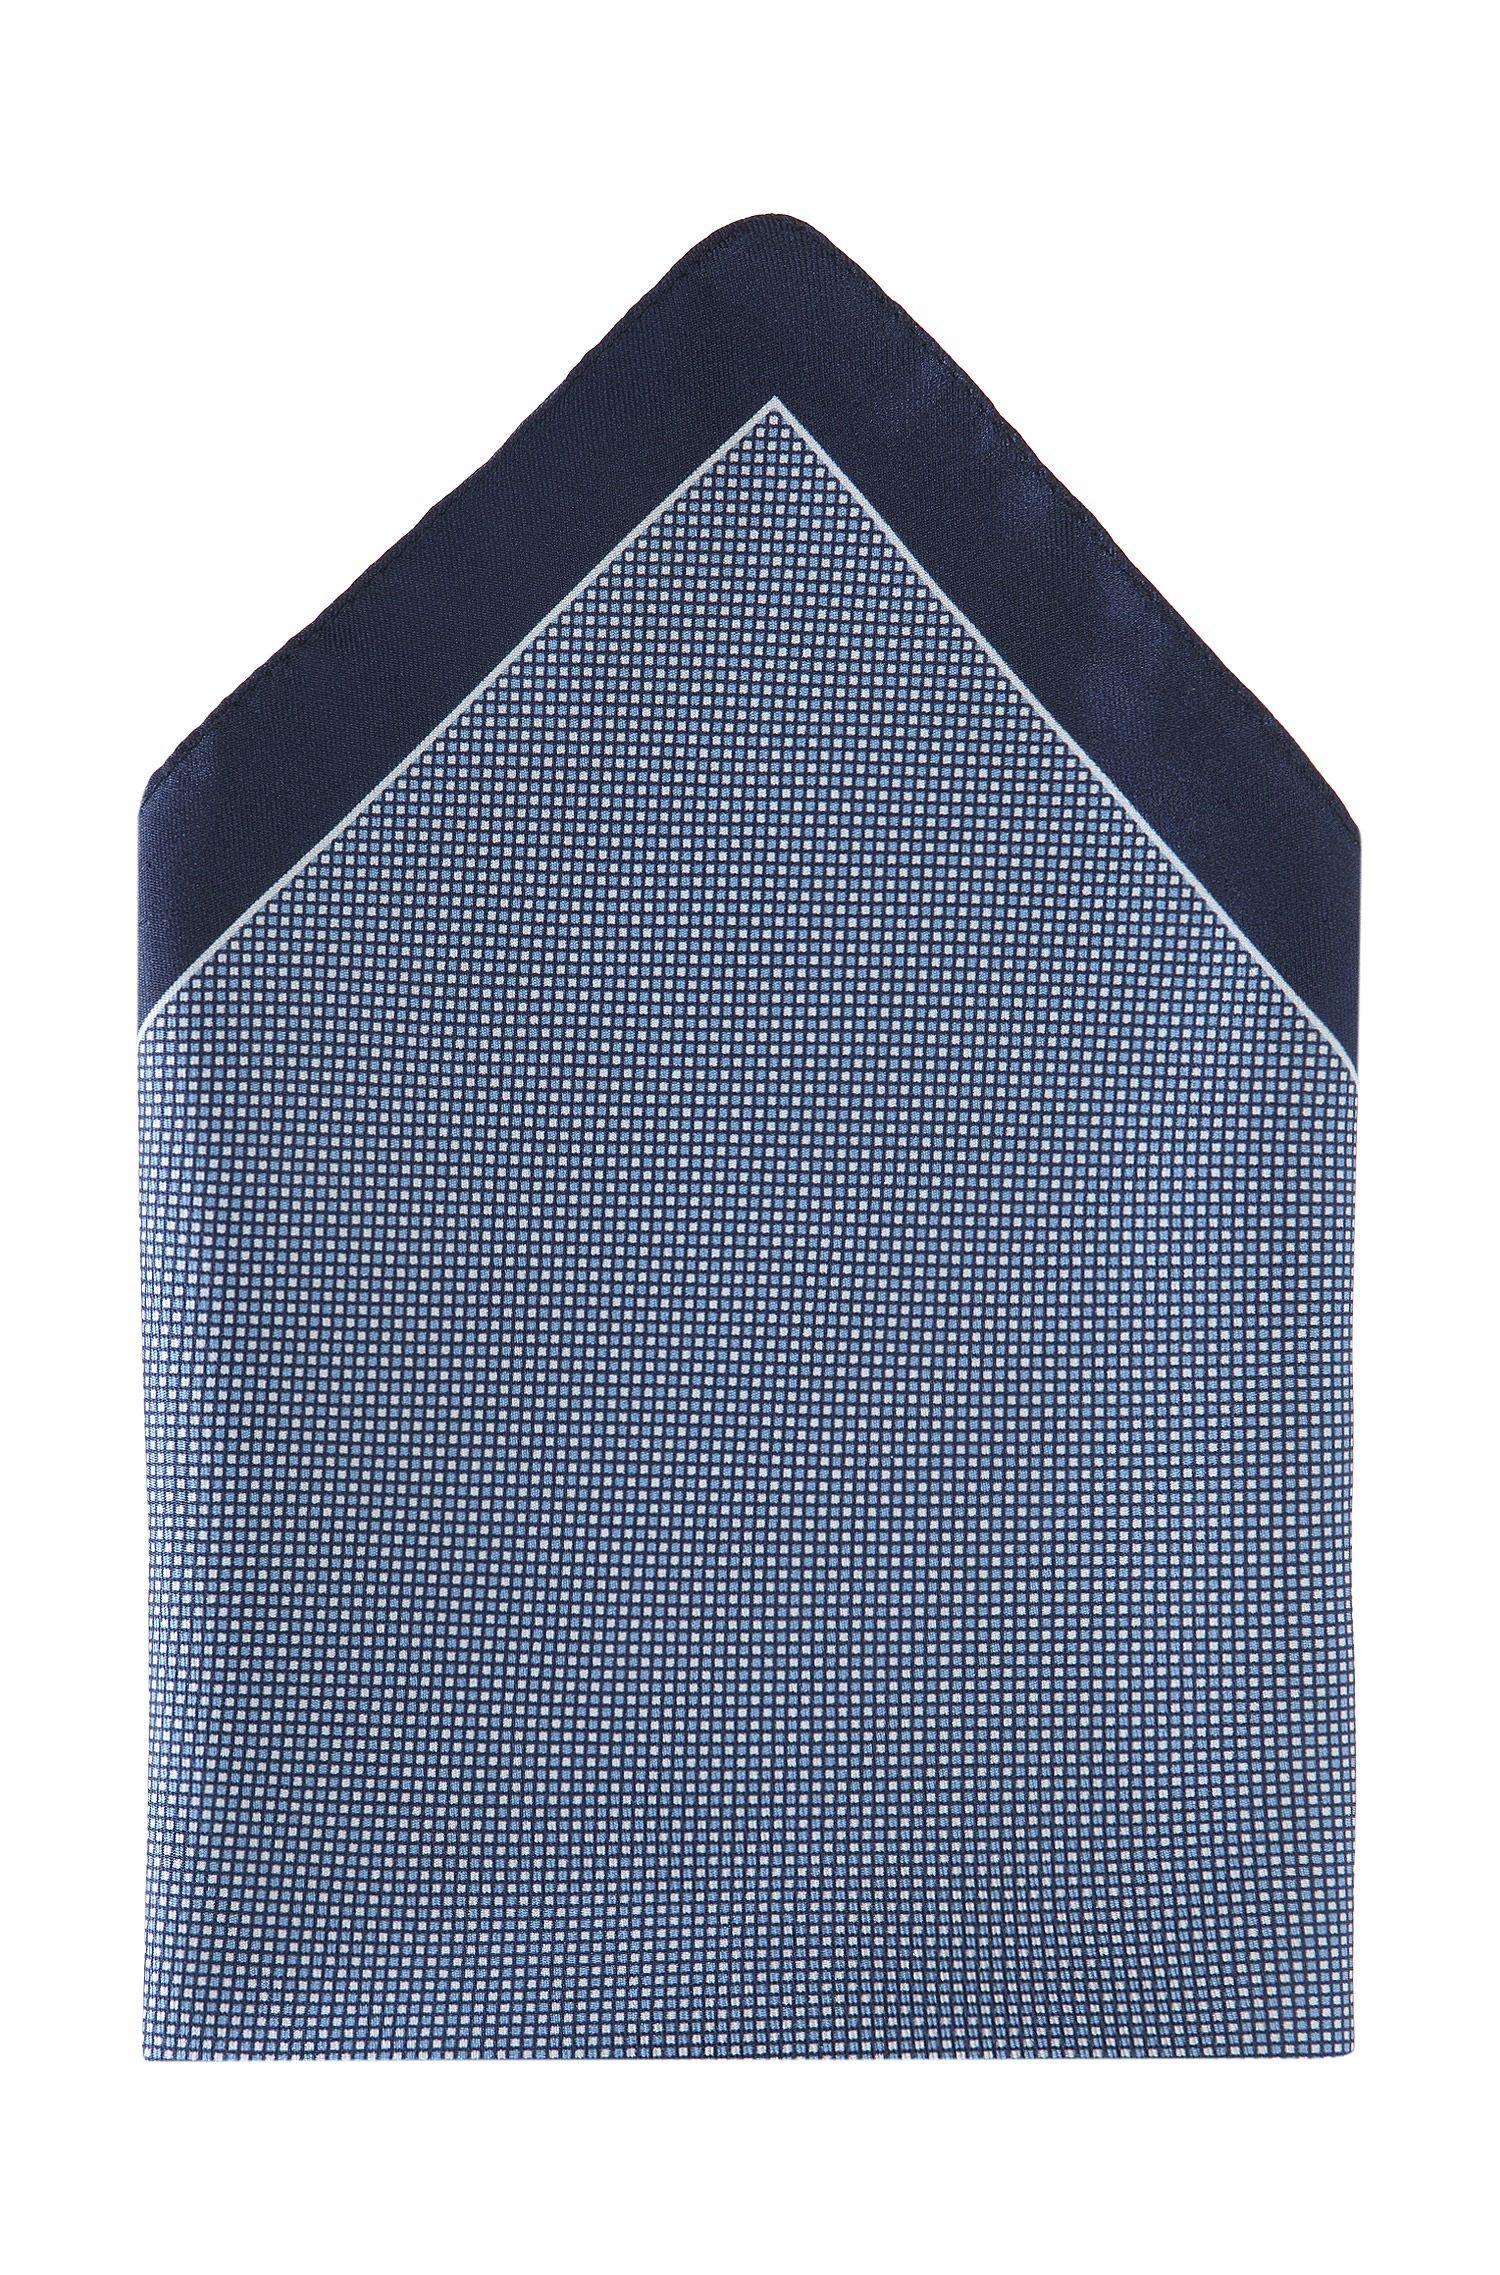 Pochette en soie, Pocket square 33 x 33